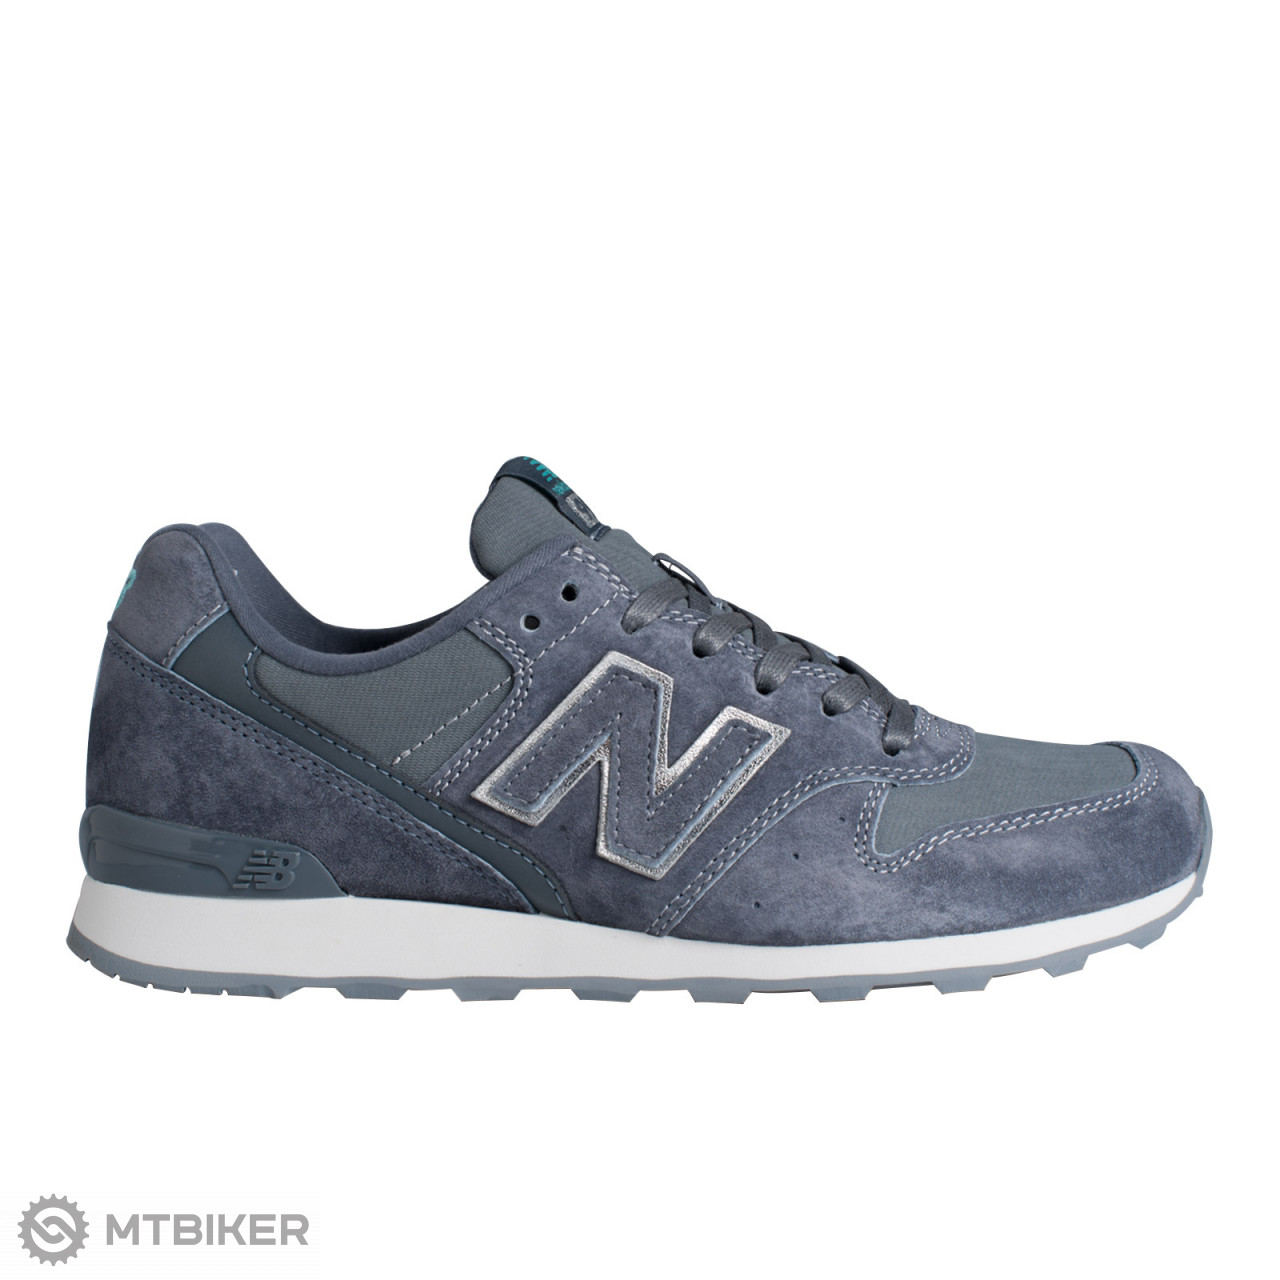 6f6872554ee9 New Balance WR996EB-D dámske lifestylové topánky sivé - MTBIKER Shop